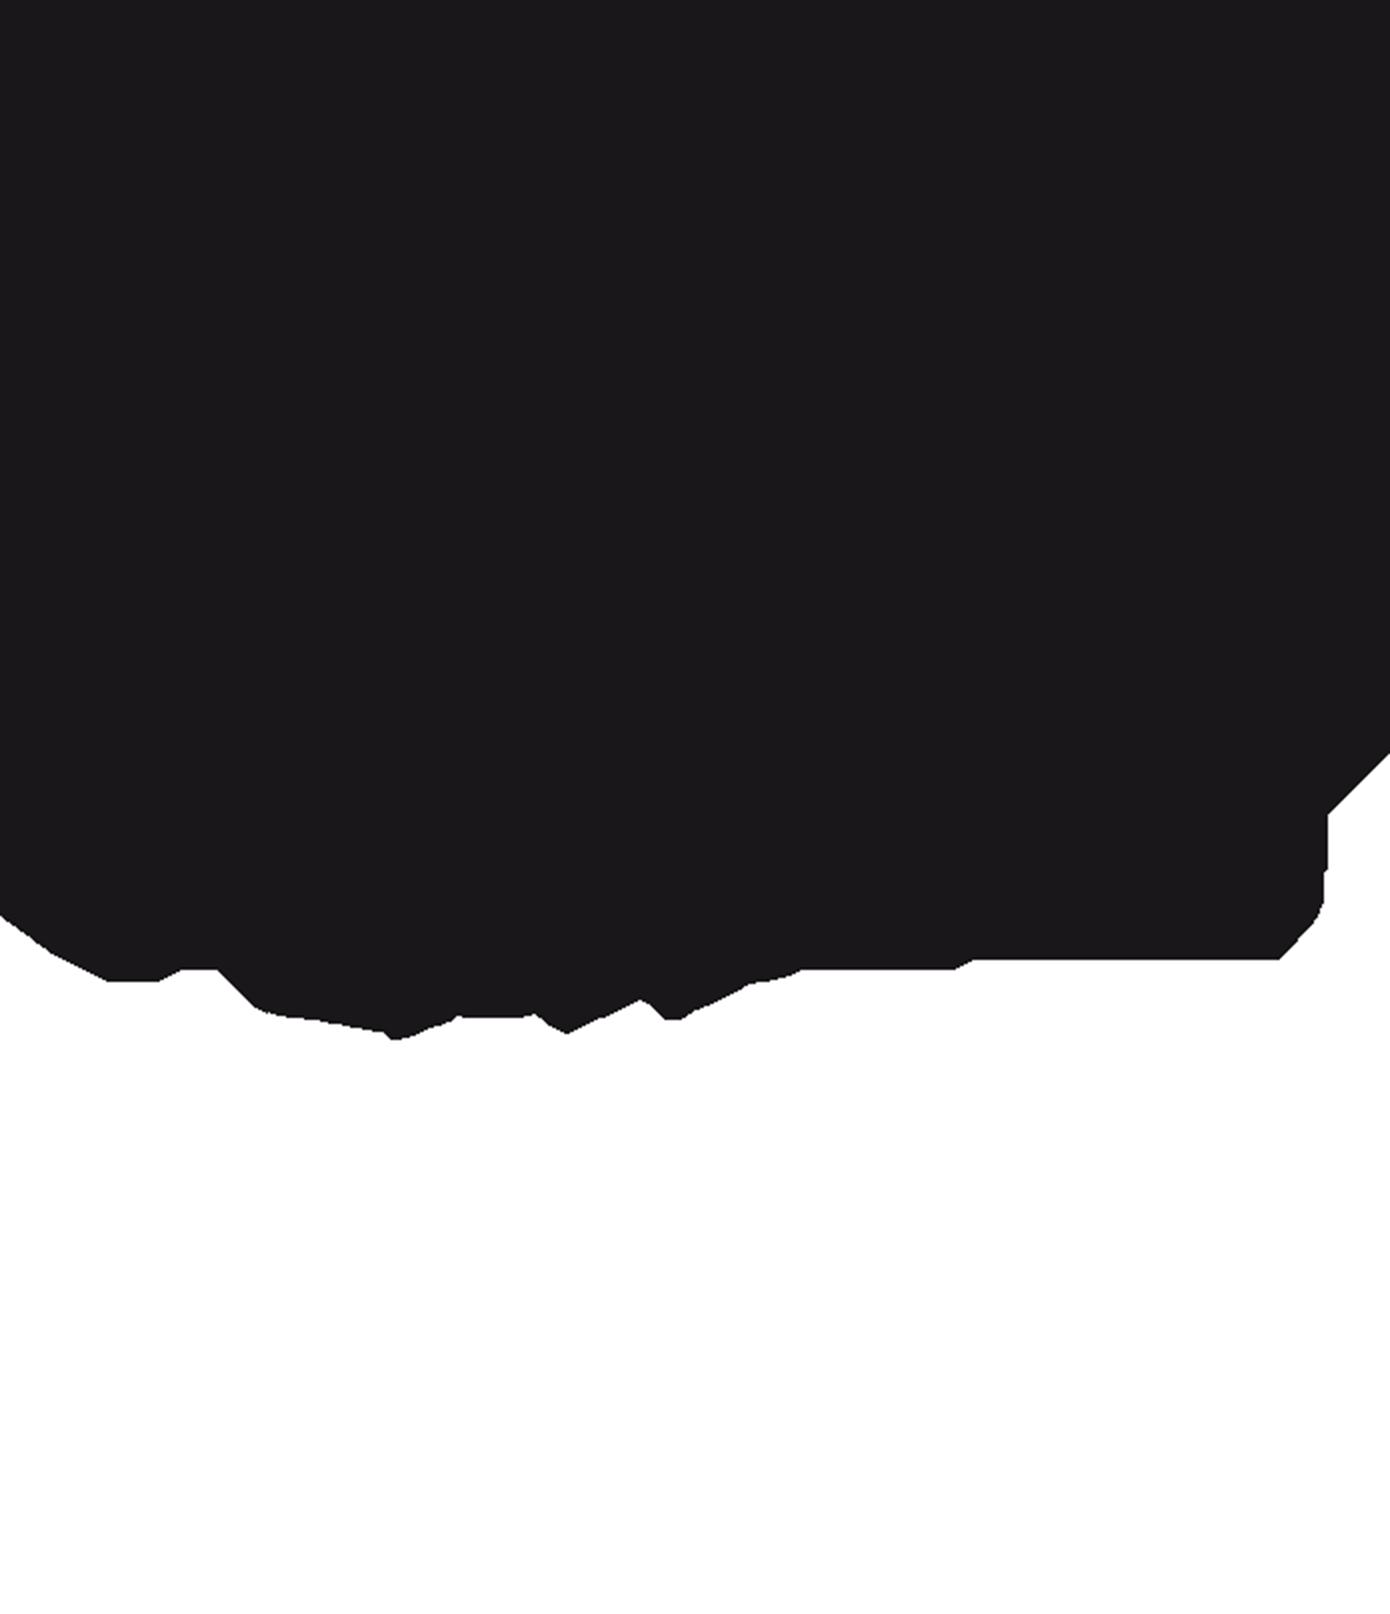 francisco-del-valle-logo@2x